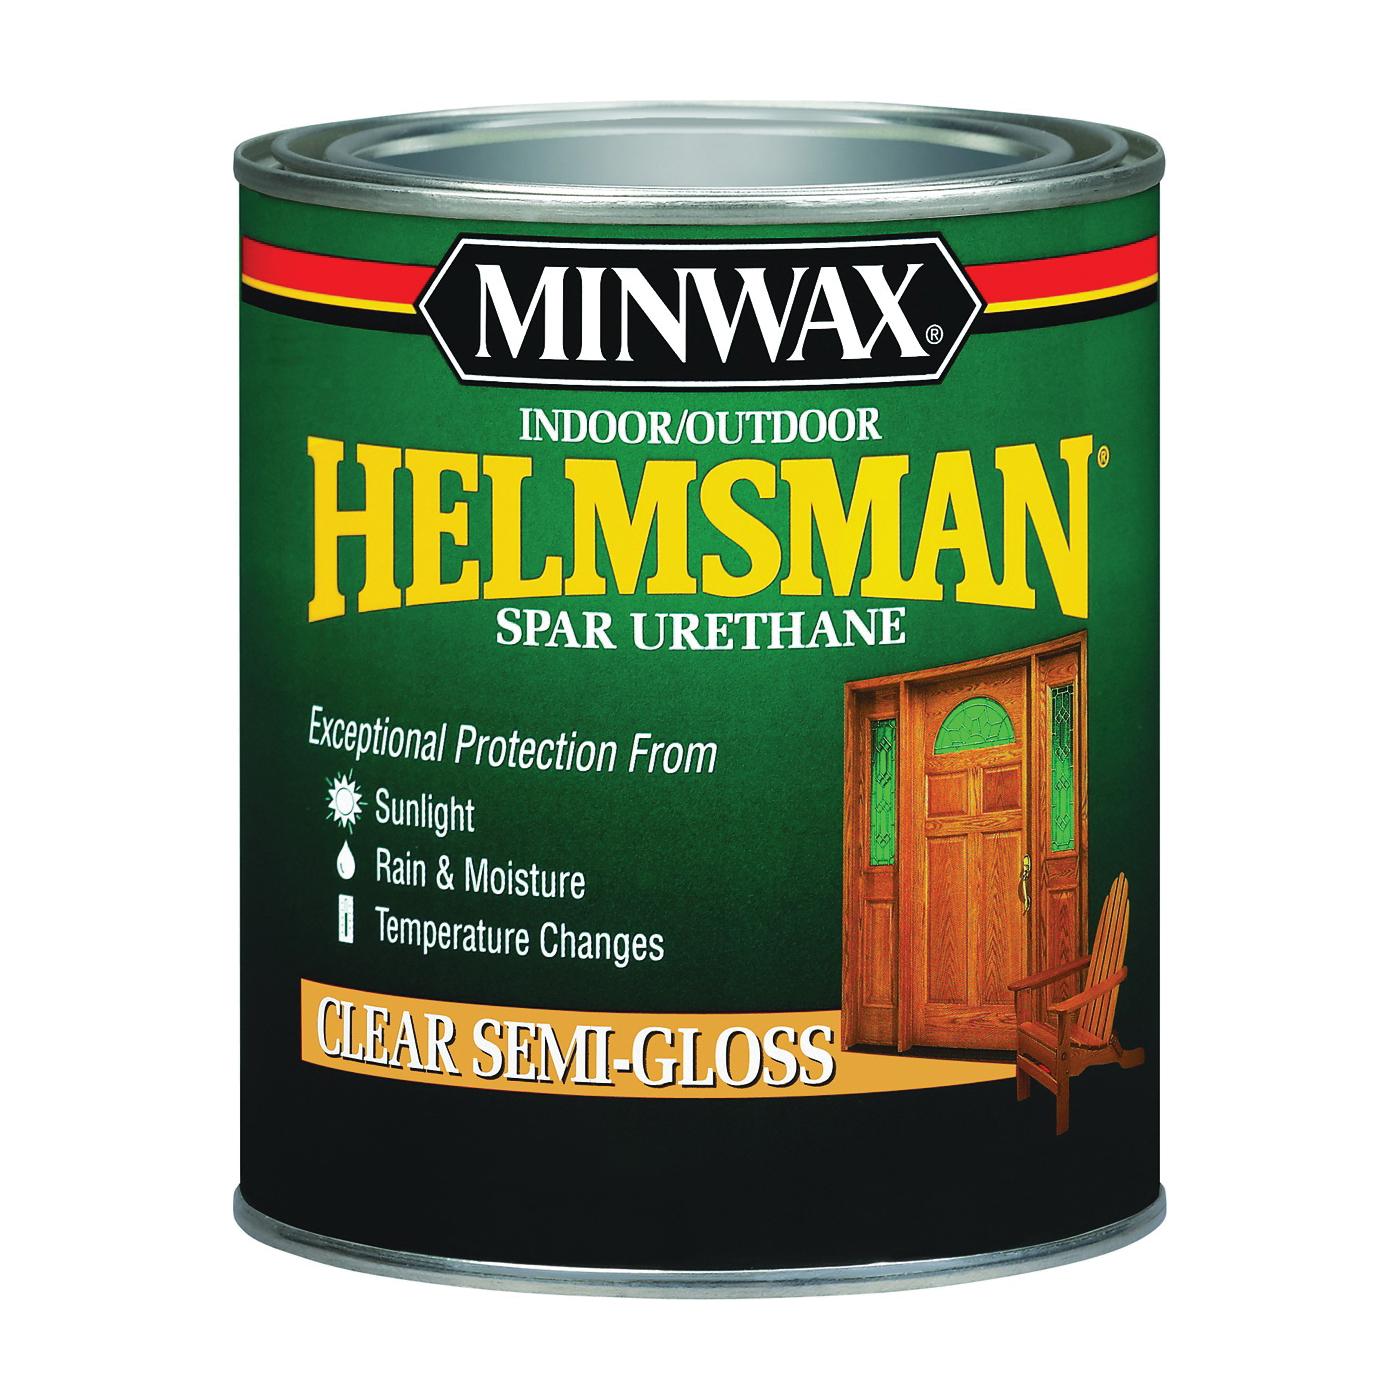 Picture of Minwax Helmsman 43210000 Spar Urethane Paint, Semi-Gloss, Clear, Liquid, 1 pt, Can